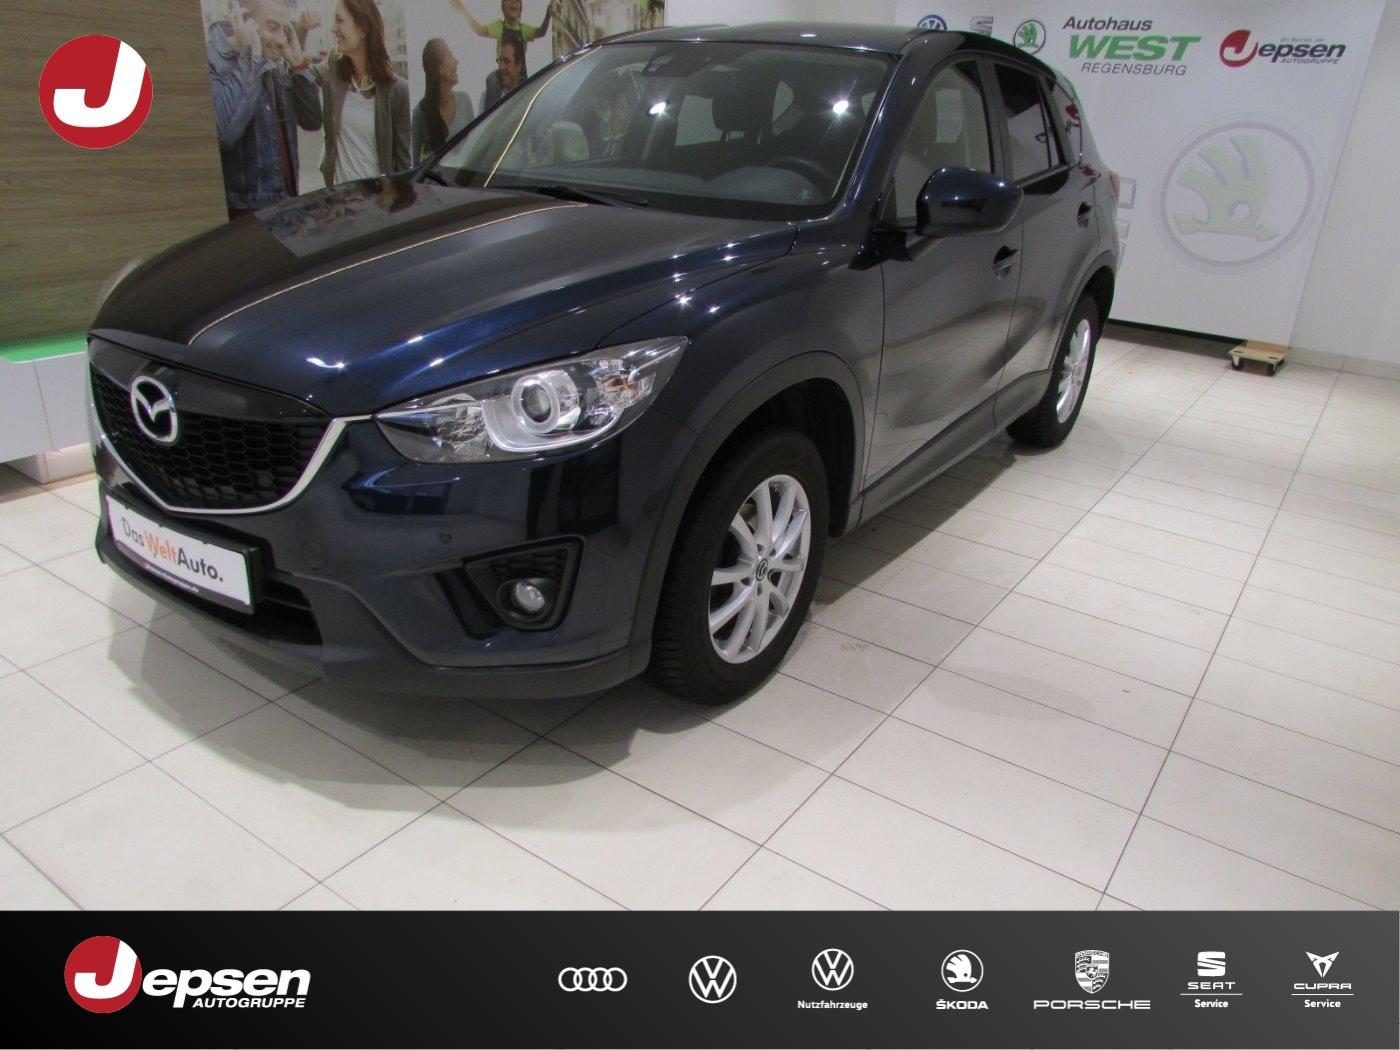 Mazda CX5 SKYACTIV-G 2.0 /NAVI /KLIMA /LM Alufelgen, Jahr 2014, Benzin